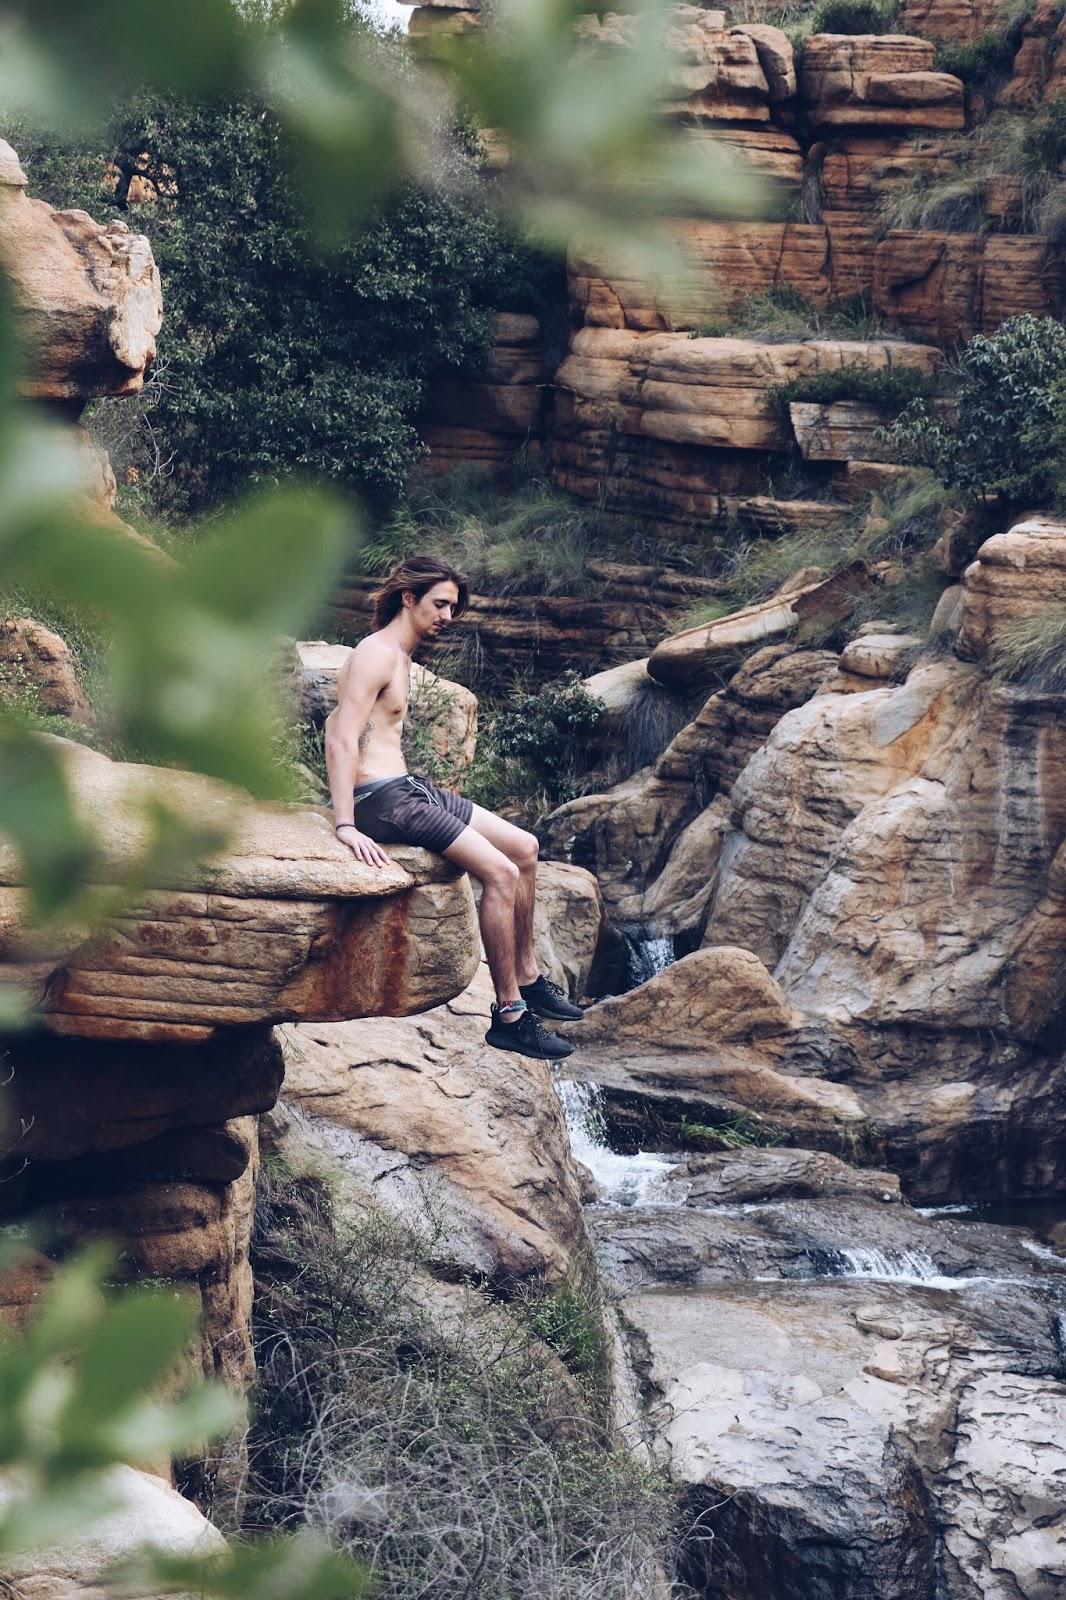 adrian stanley, travel vlogger